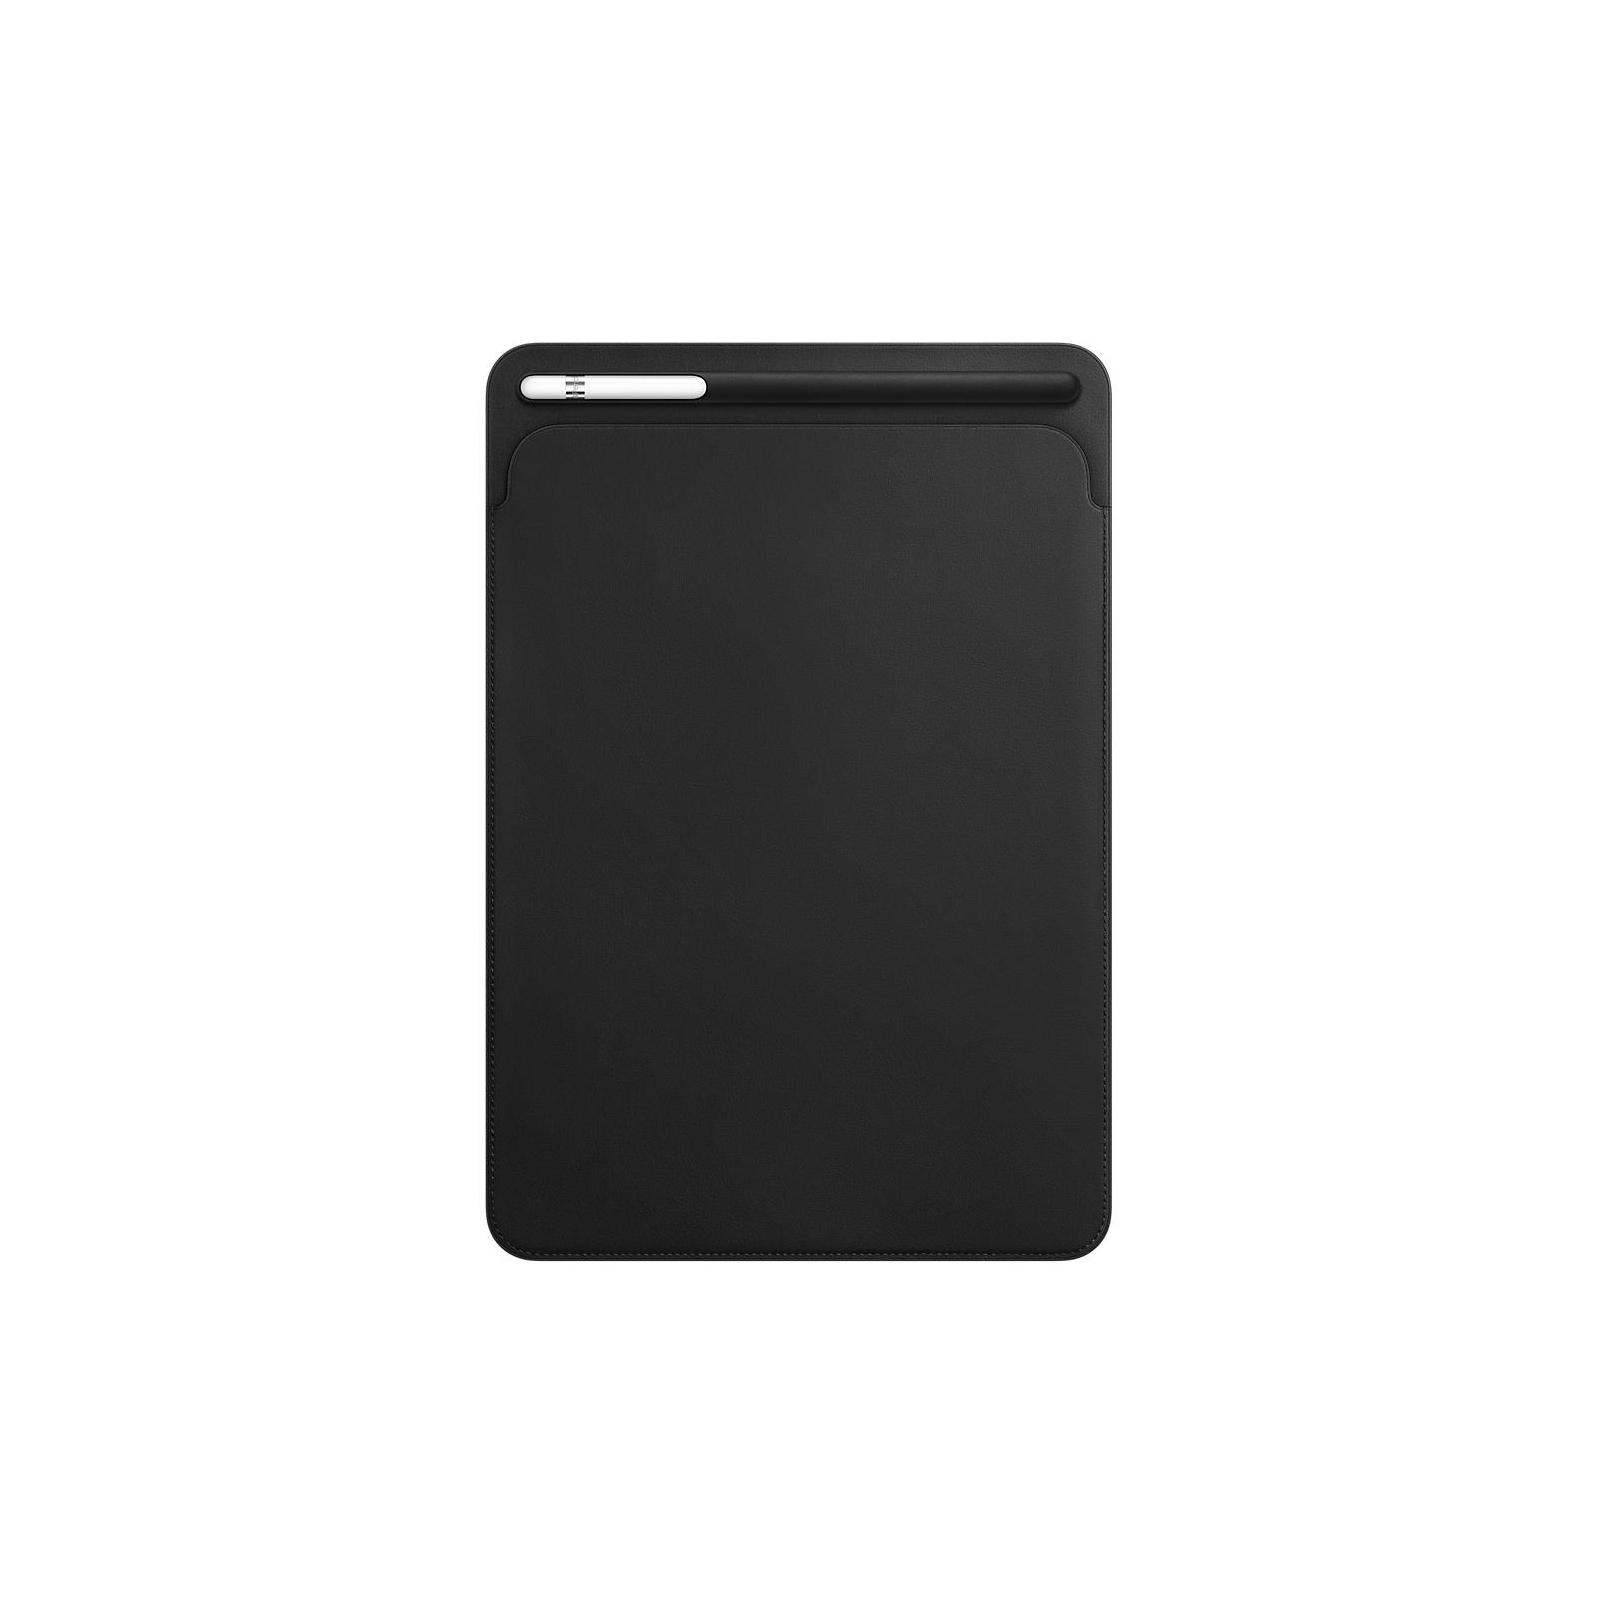 Чехол для планшета Apple Leather Sleeve for 10.5‑inch iPad Pro - Black (MPU62ZM/A)